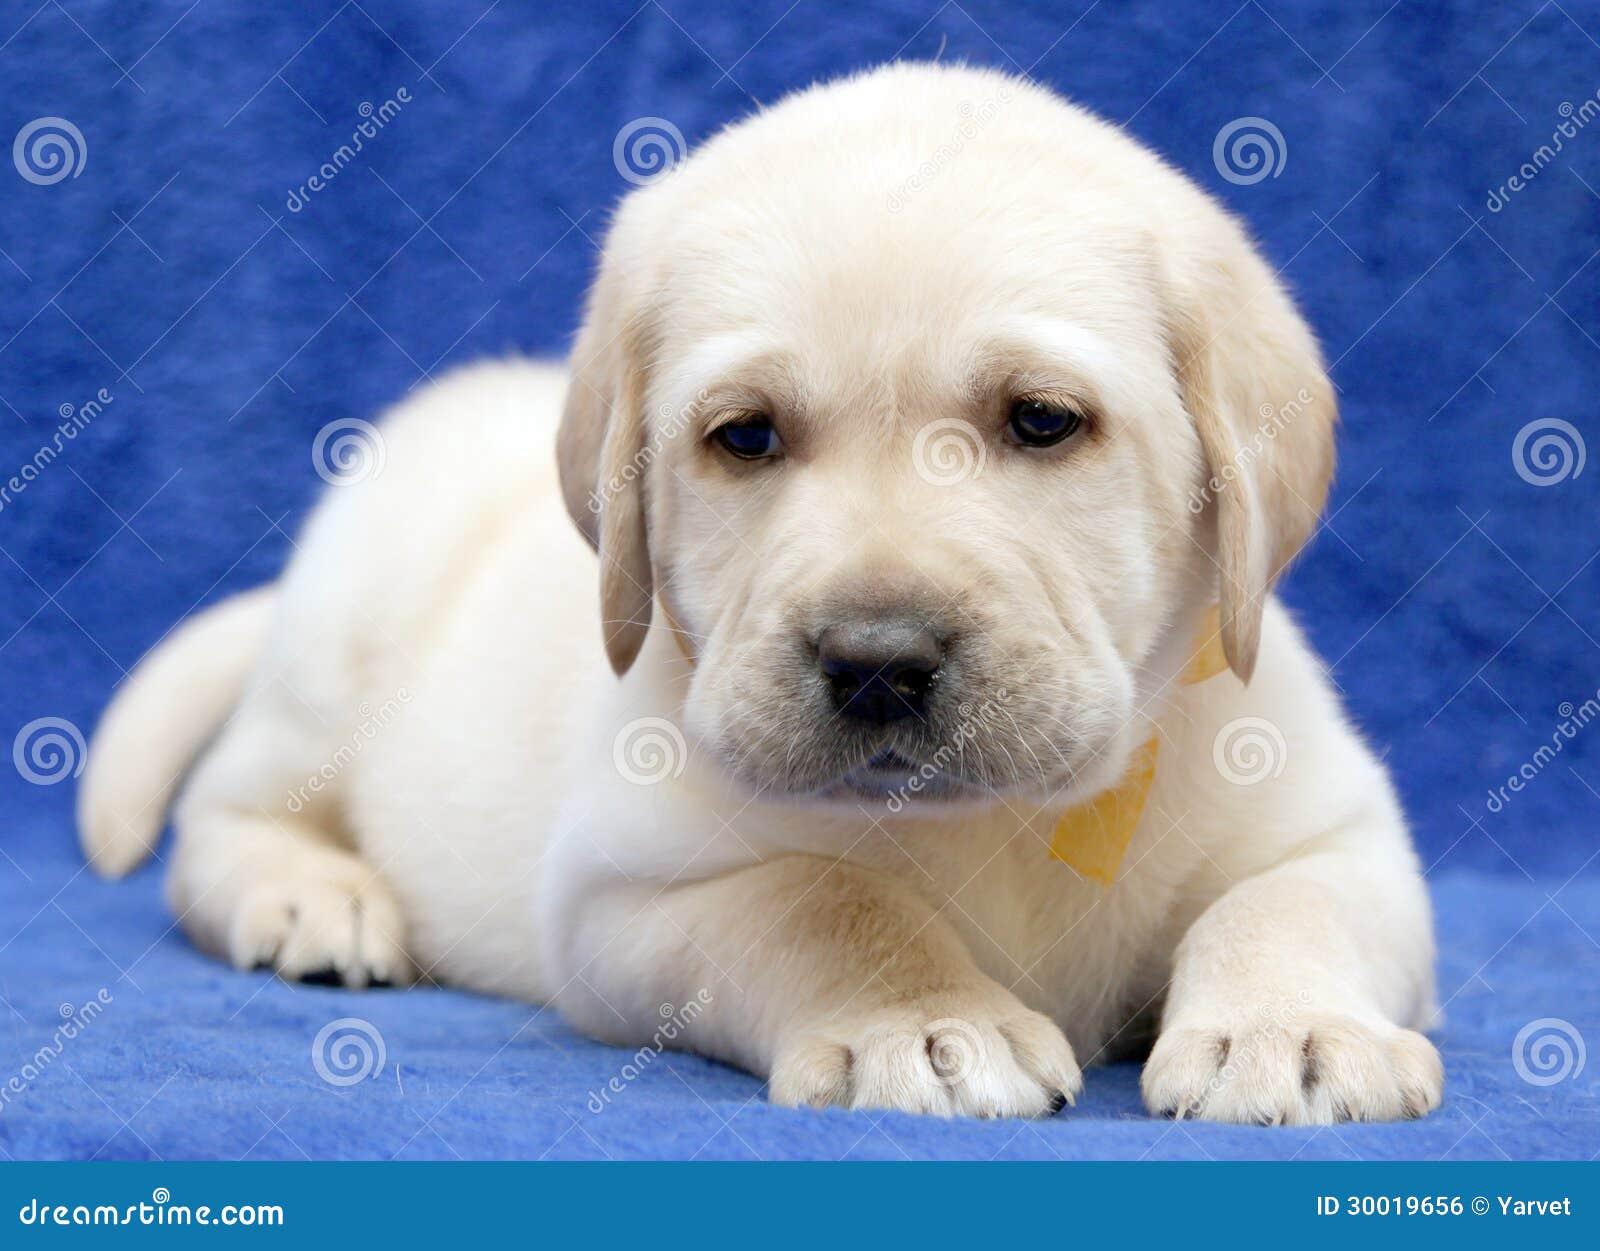 yellow lab puppy sleeping - photo #14